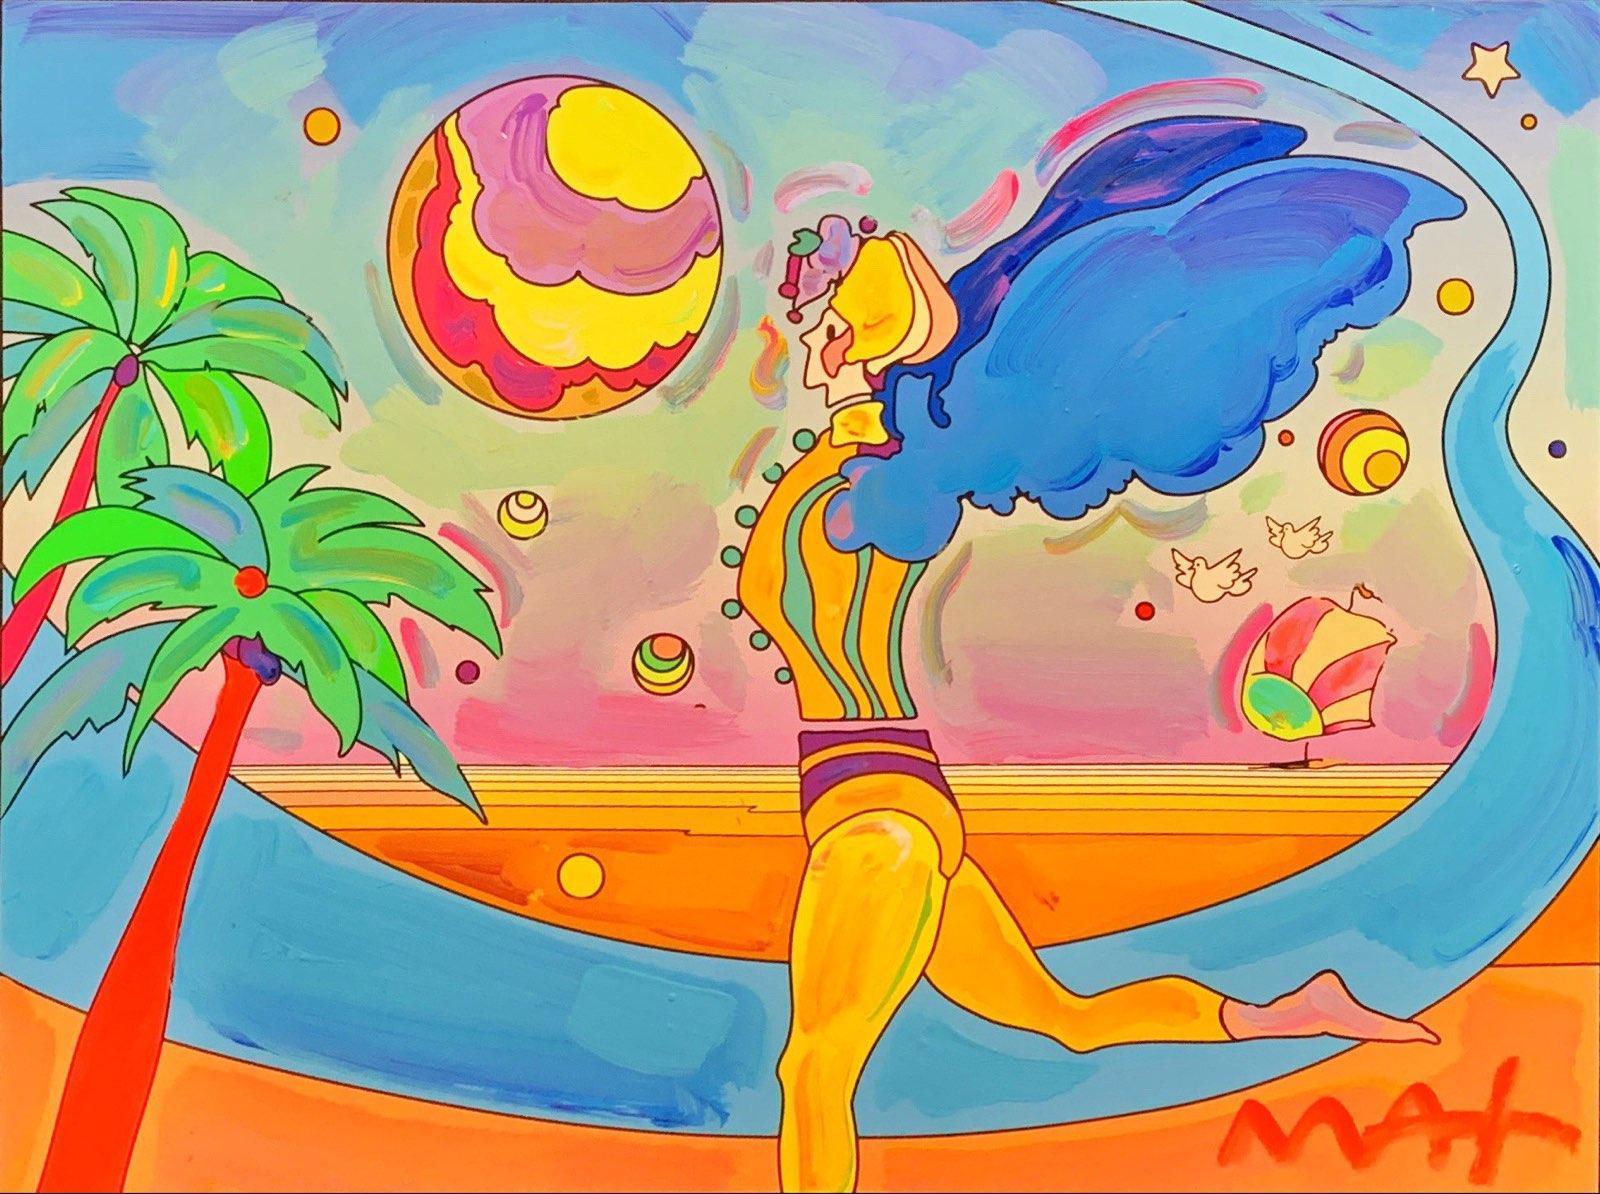 Cosmic Series: Planetarian Traveler